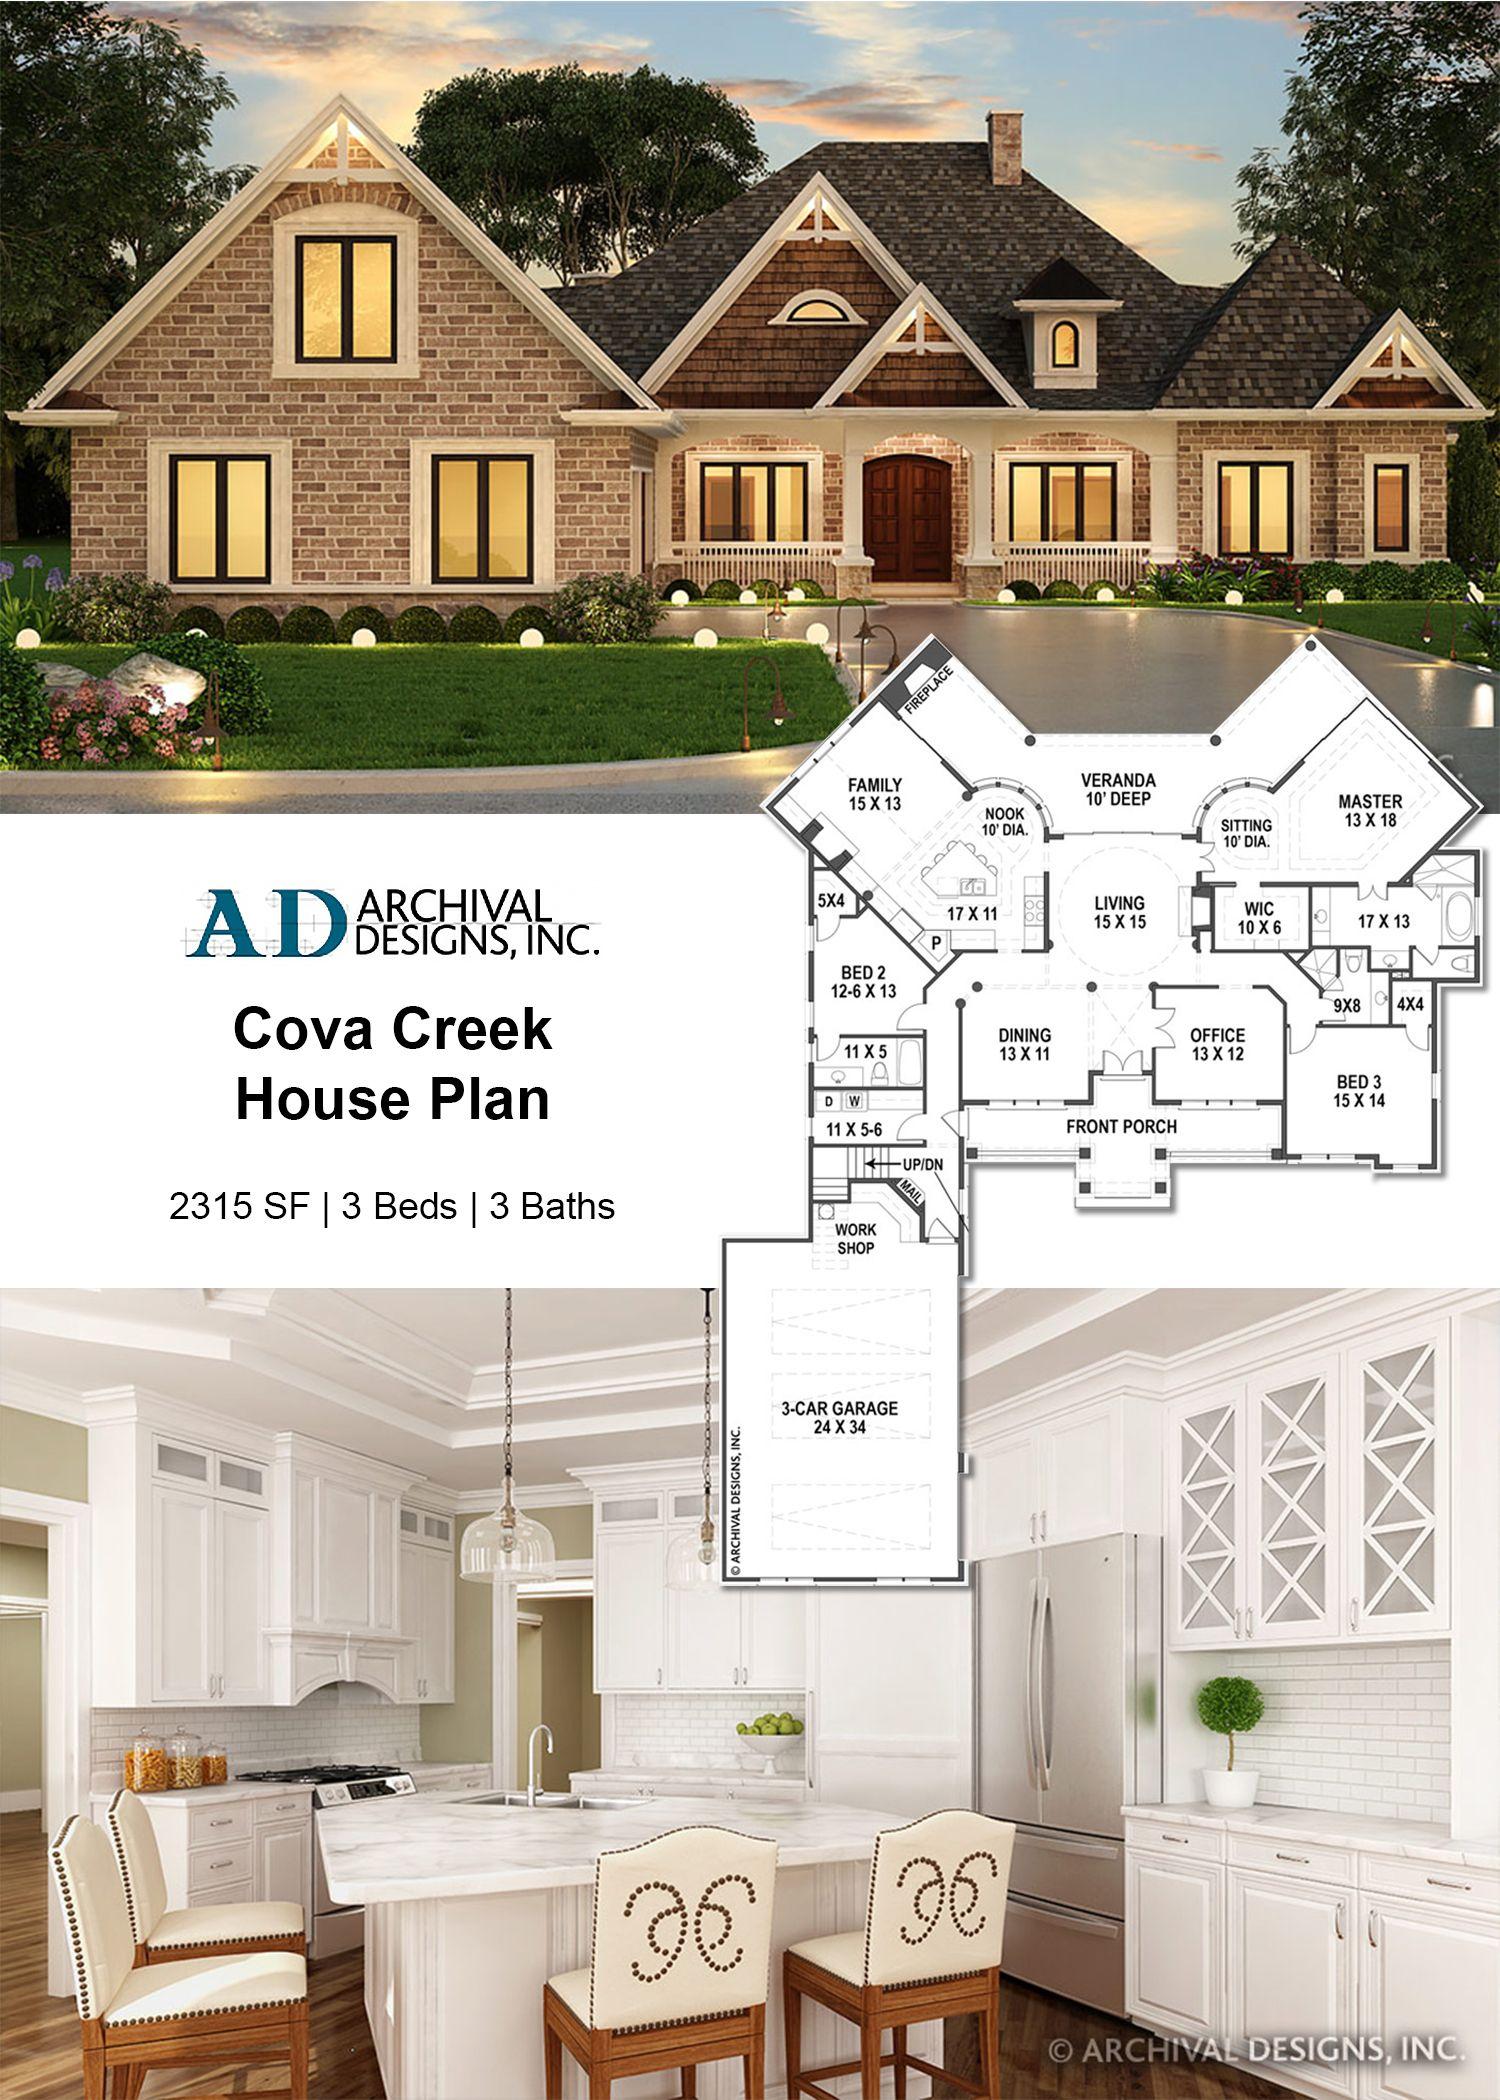 Cova Creek House Plan Ranch House Designs Craftsman House Plans House Plans